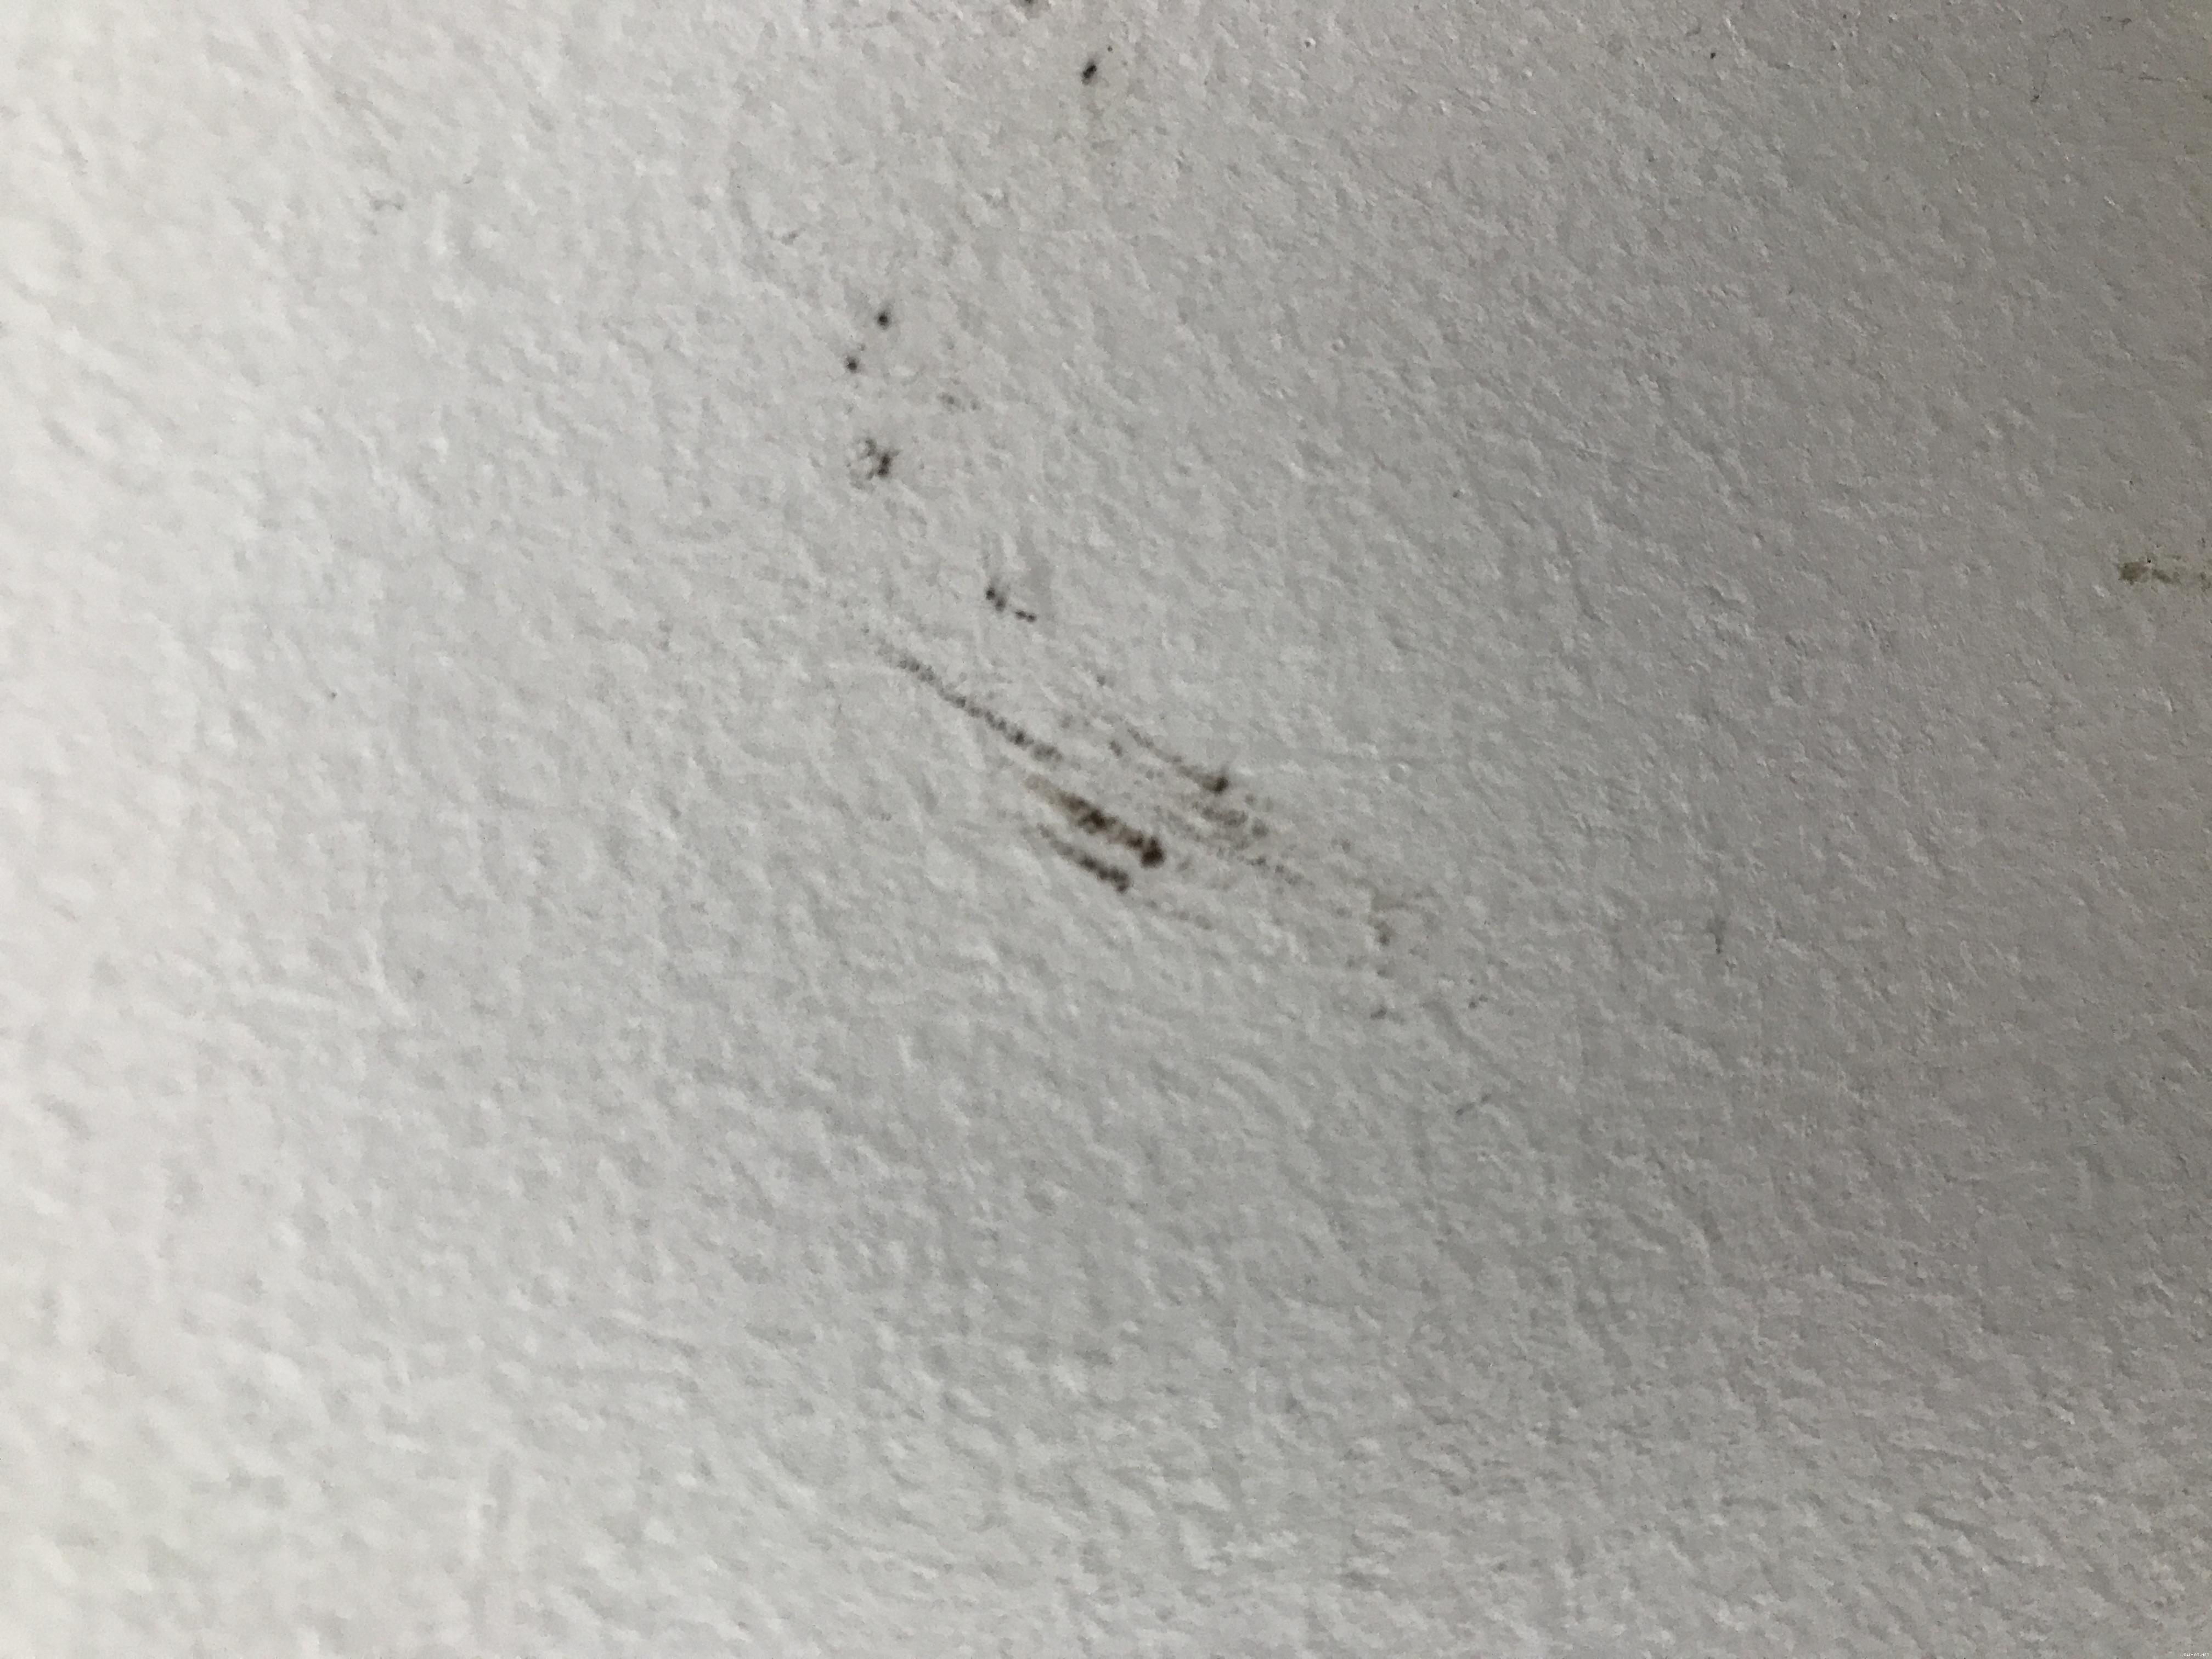 Bed Bugs In Walls Photos Wall And Door Tinfishclematis